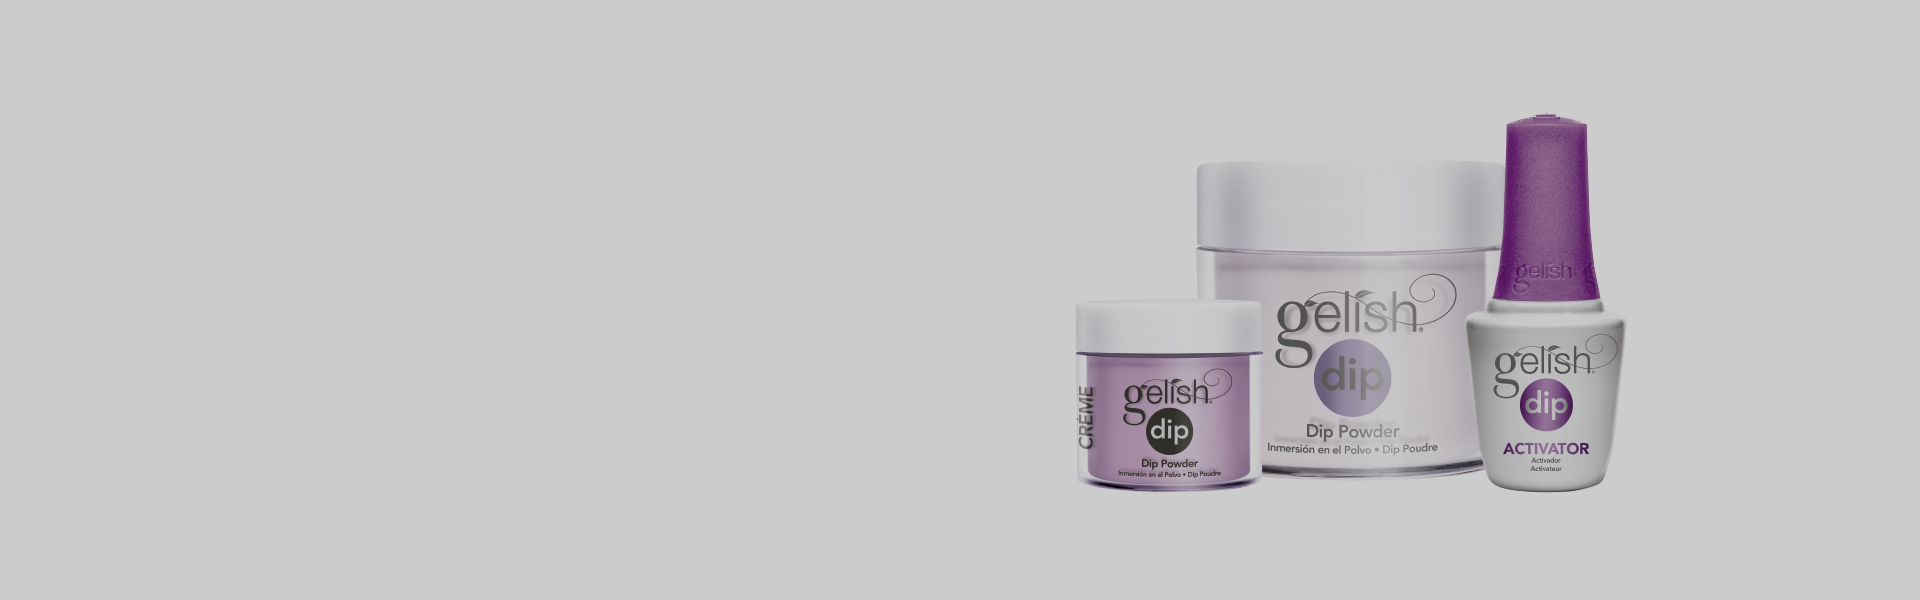 Productos Gelish® DIP